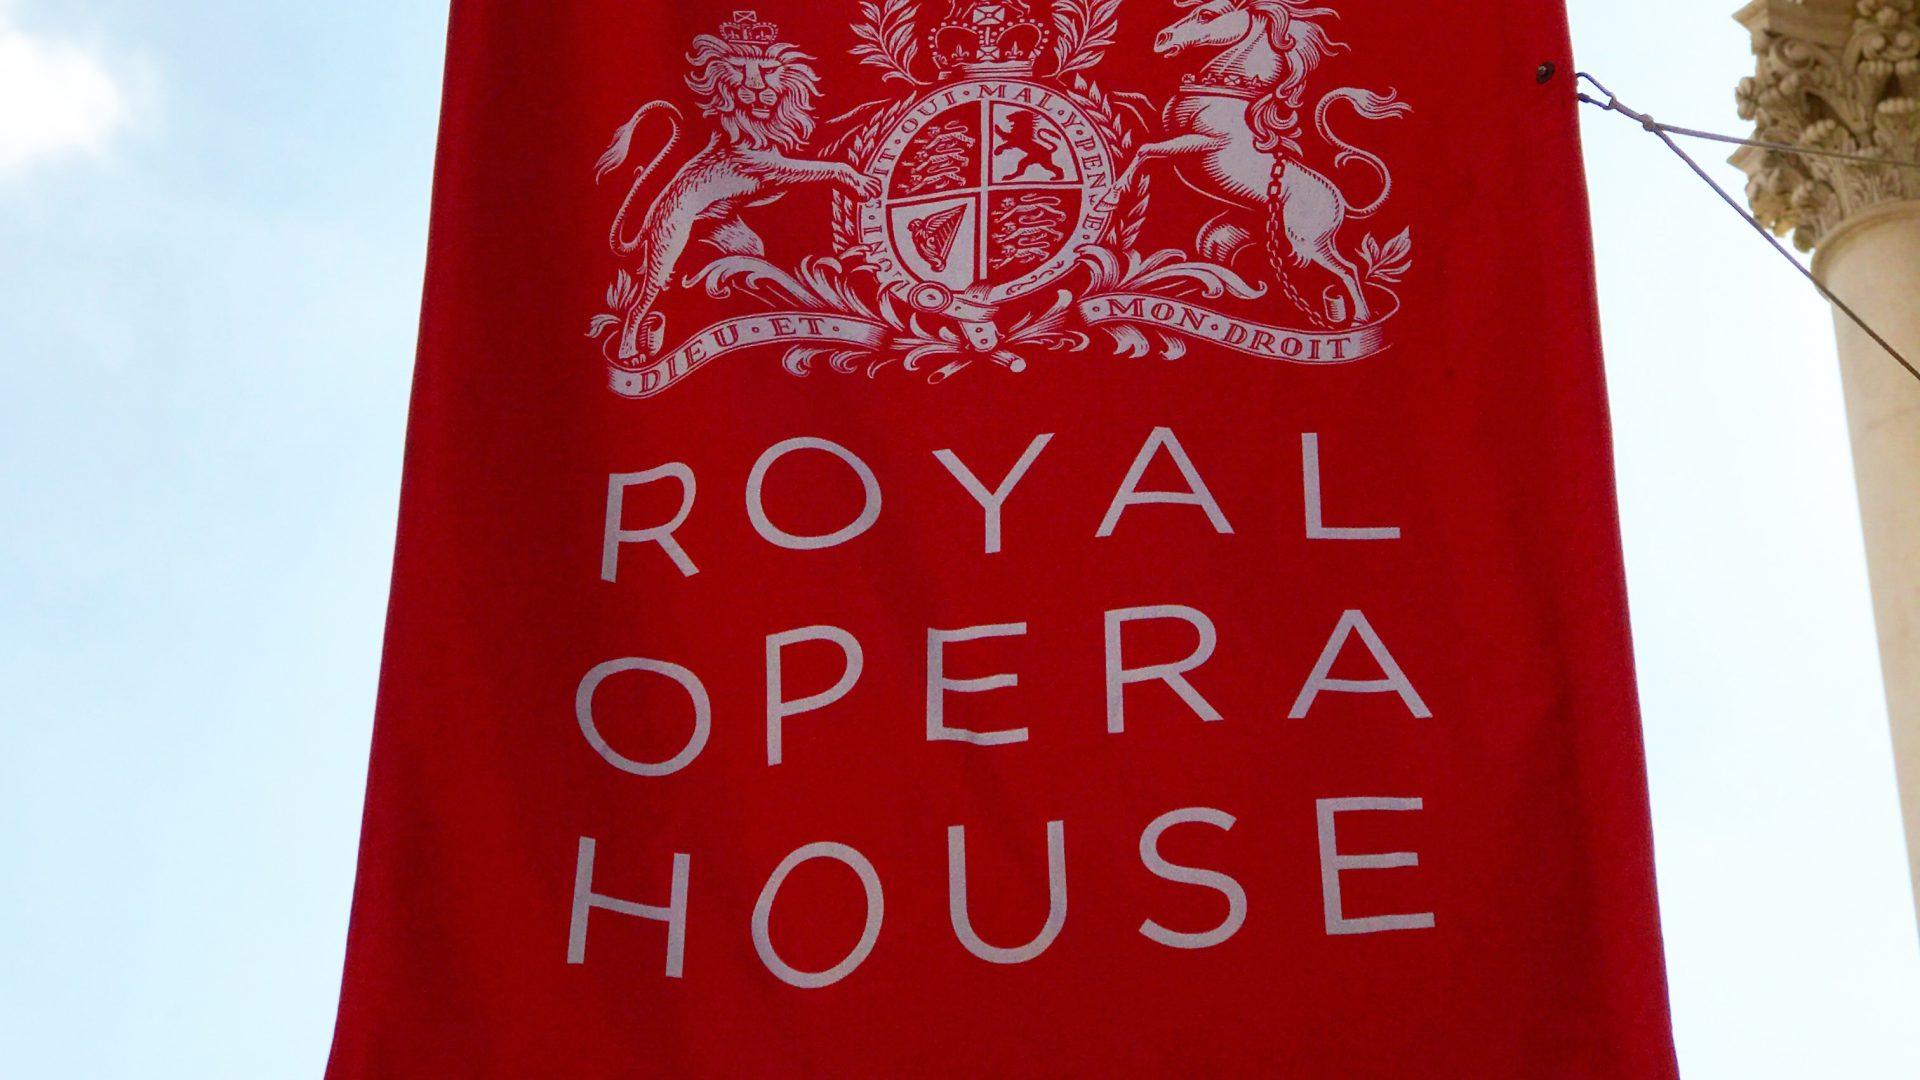 Sneak Peak - Swan Lake Rehearsal (Royal Opera House)